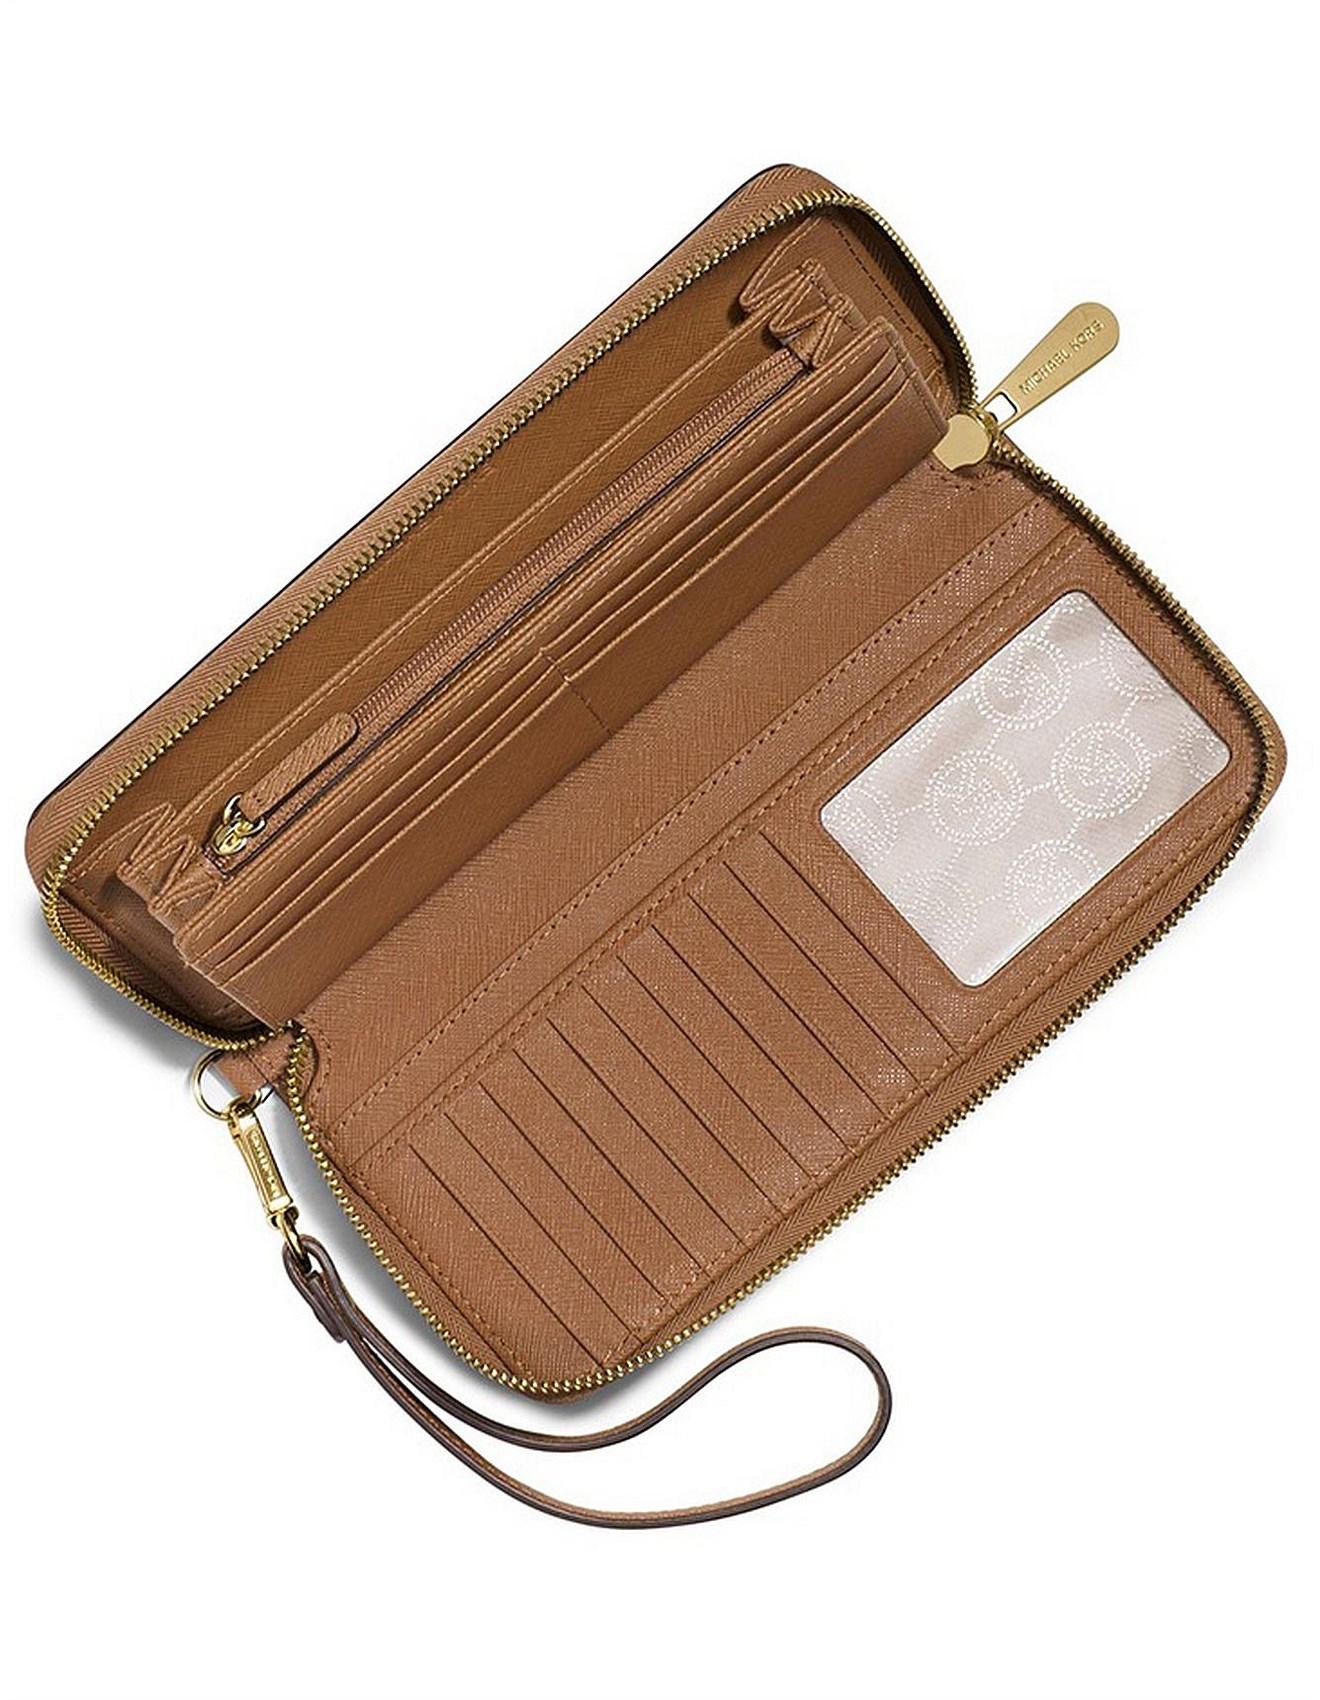 3dfbc93f0b40 Jet Set Travel Leather Continental Wristlet. 1  2  3. Zoom. Michael Kors